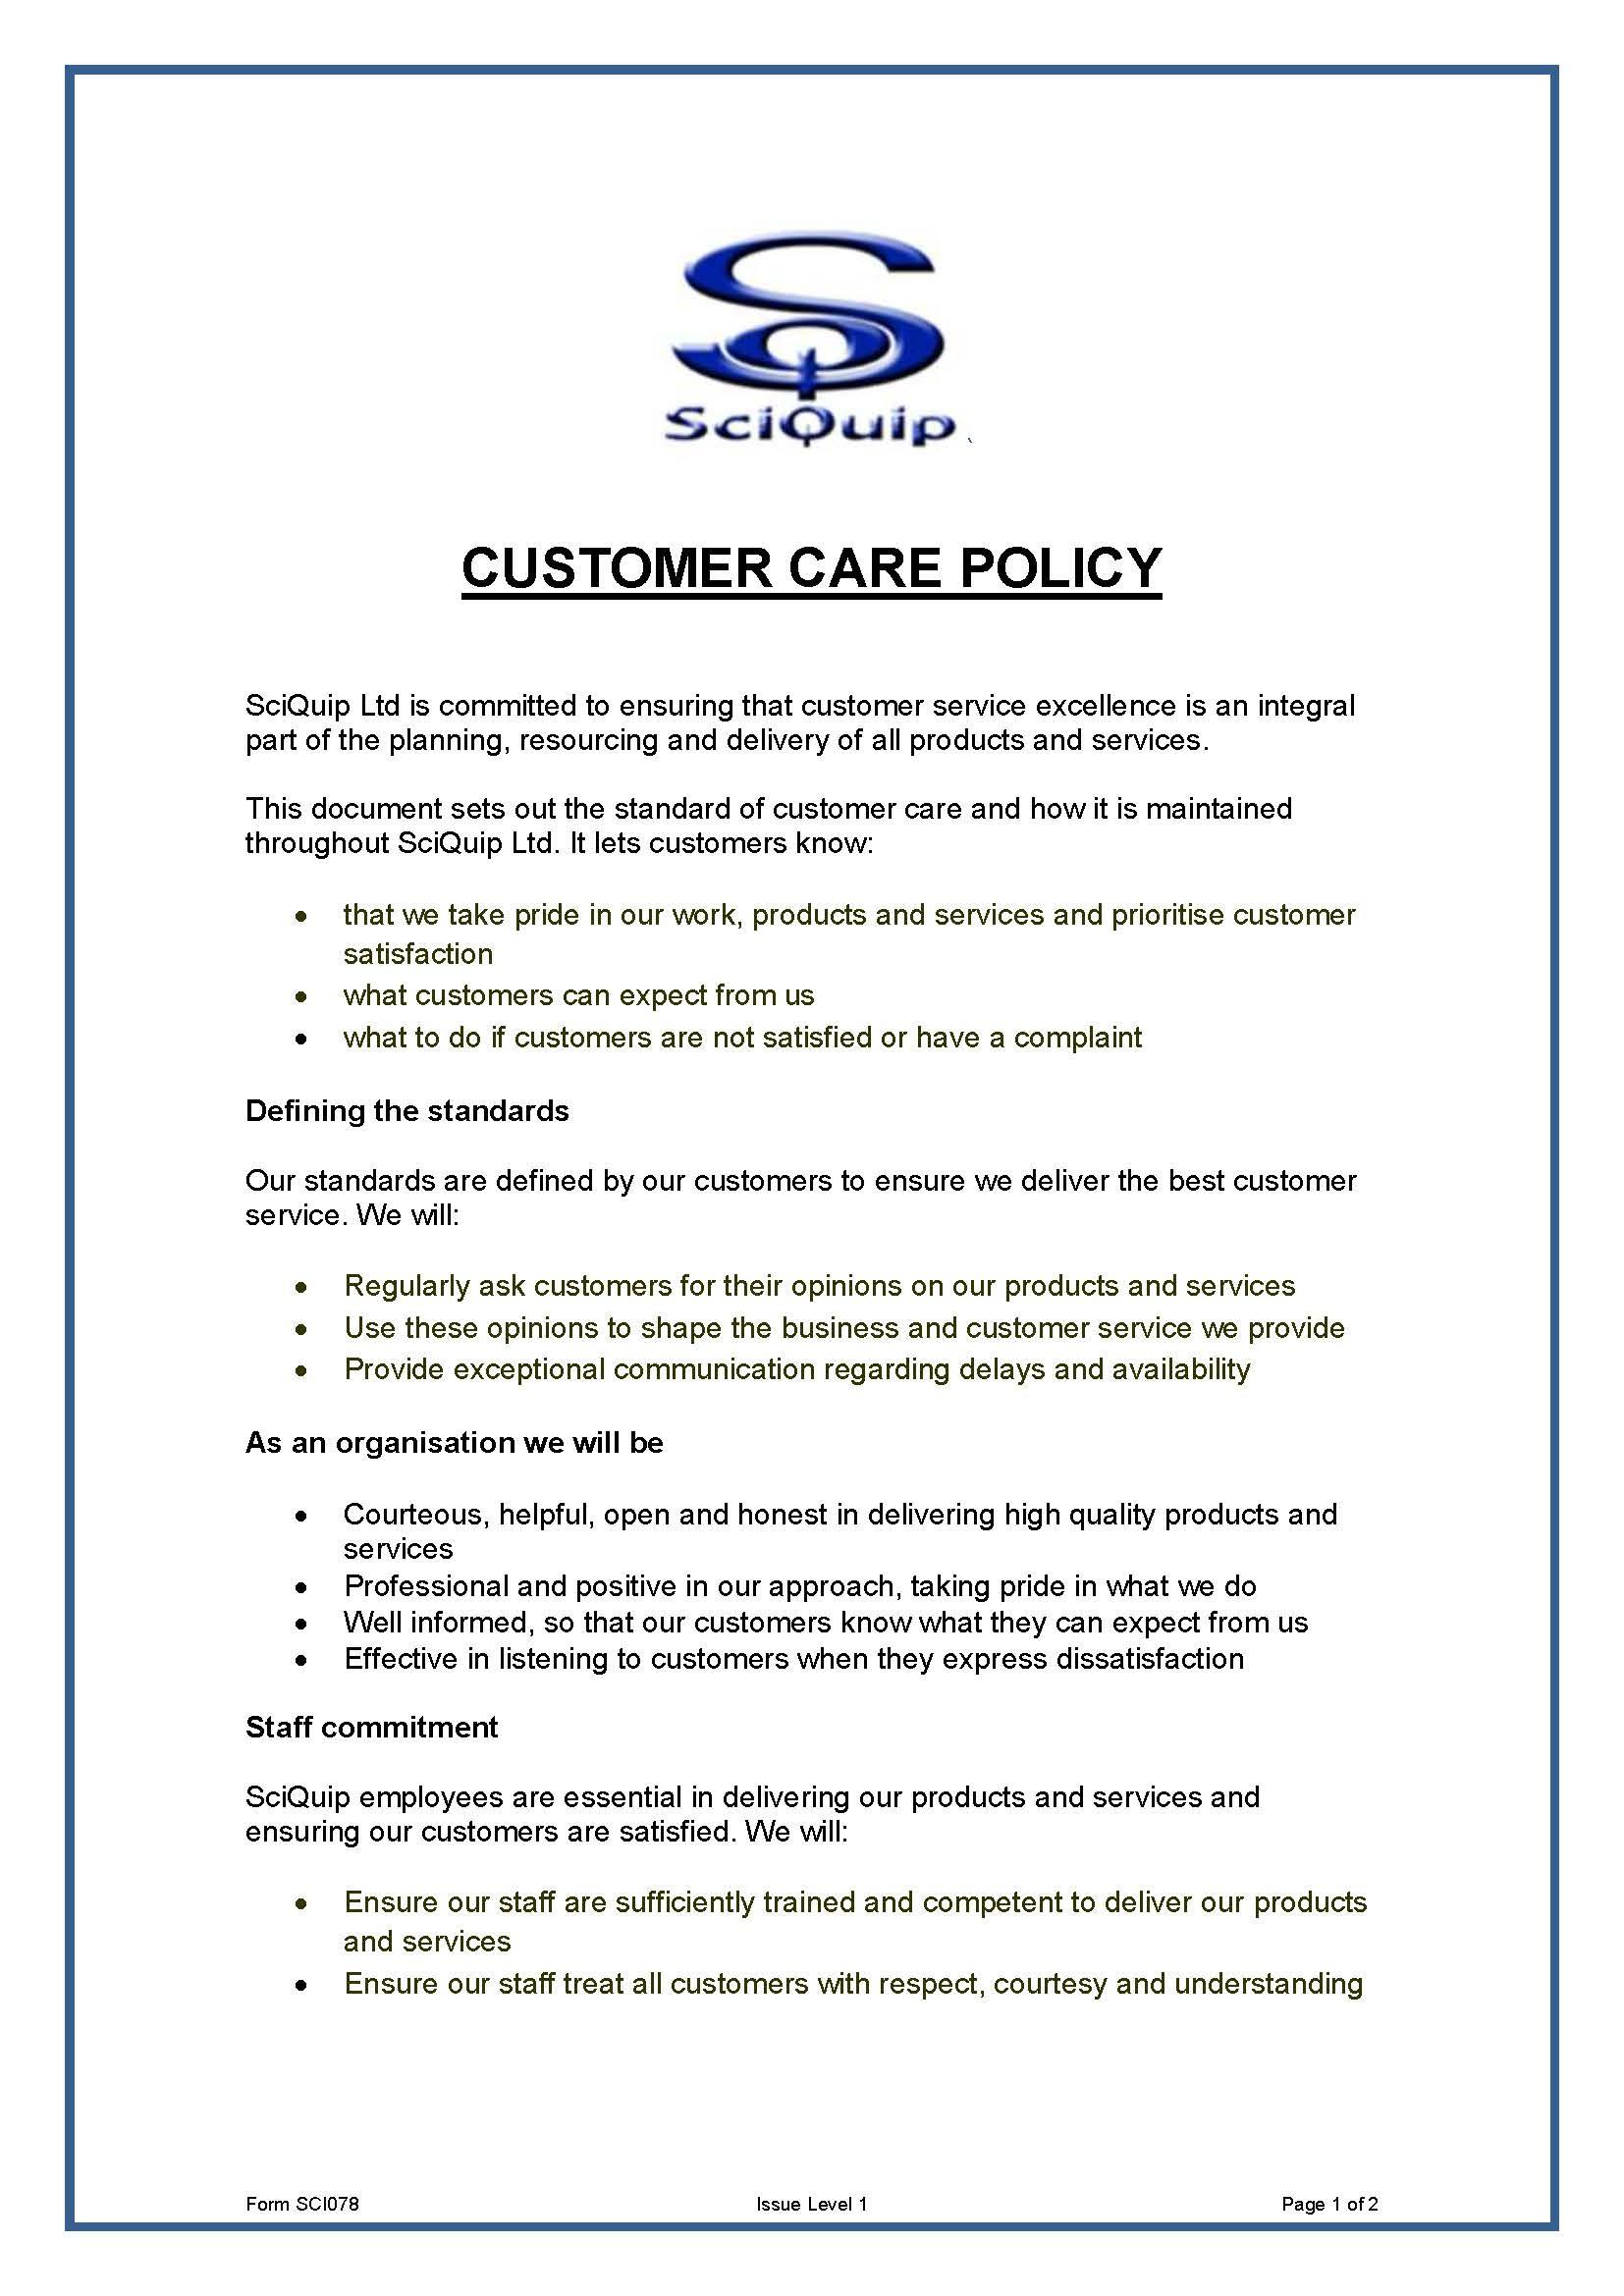 Customer Care Policy